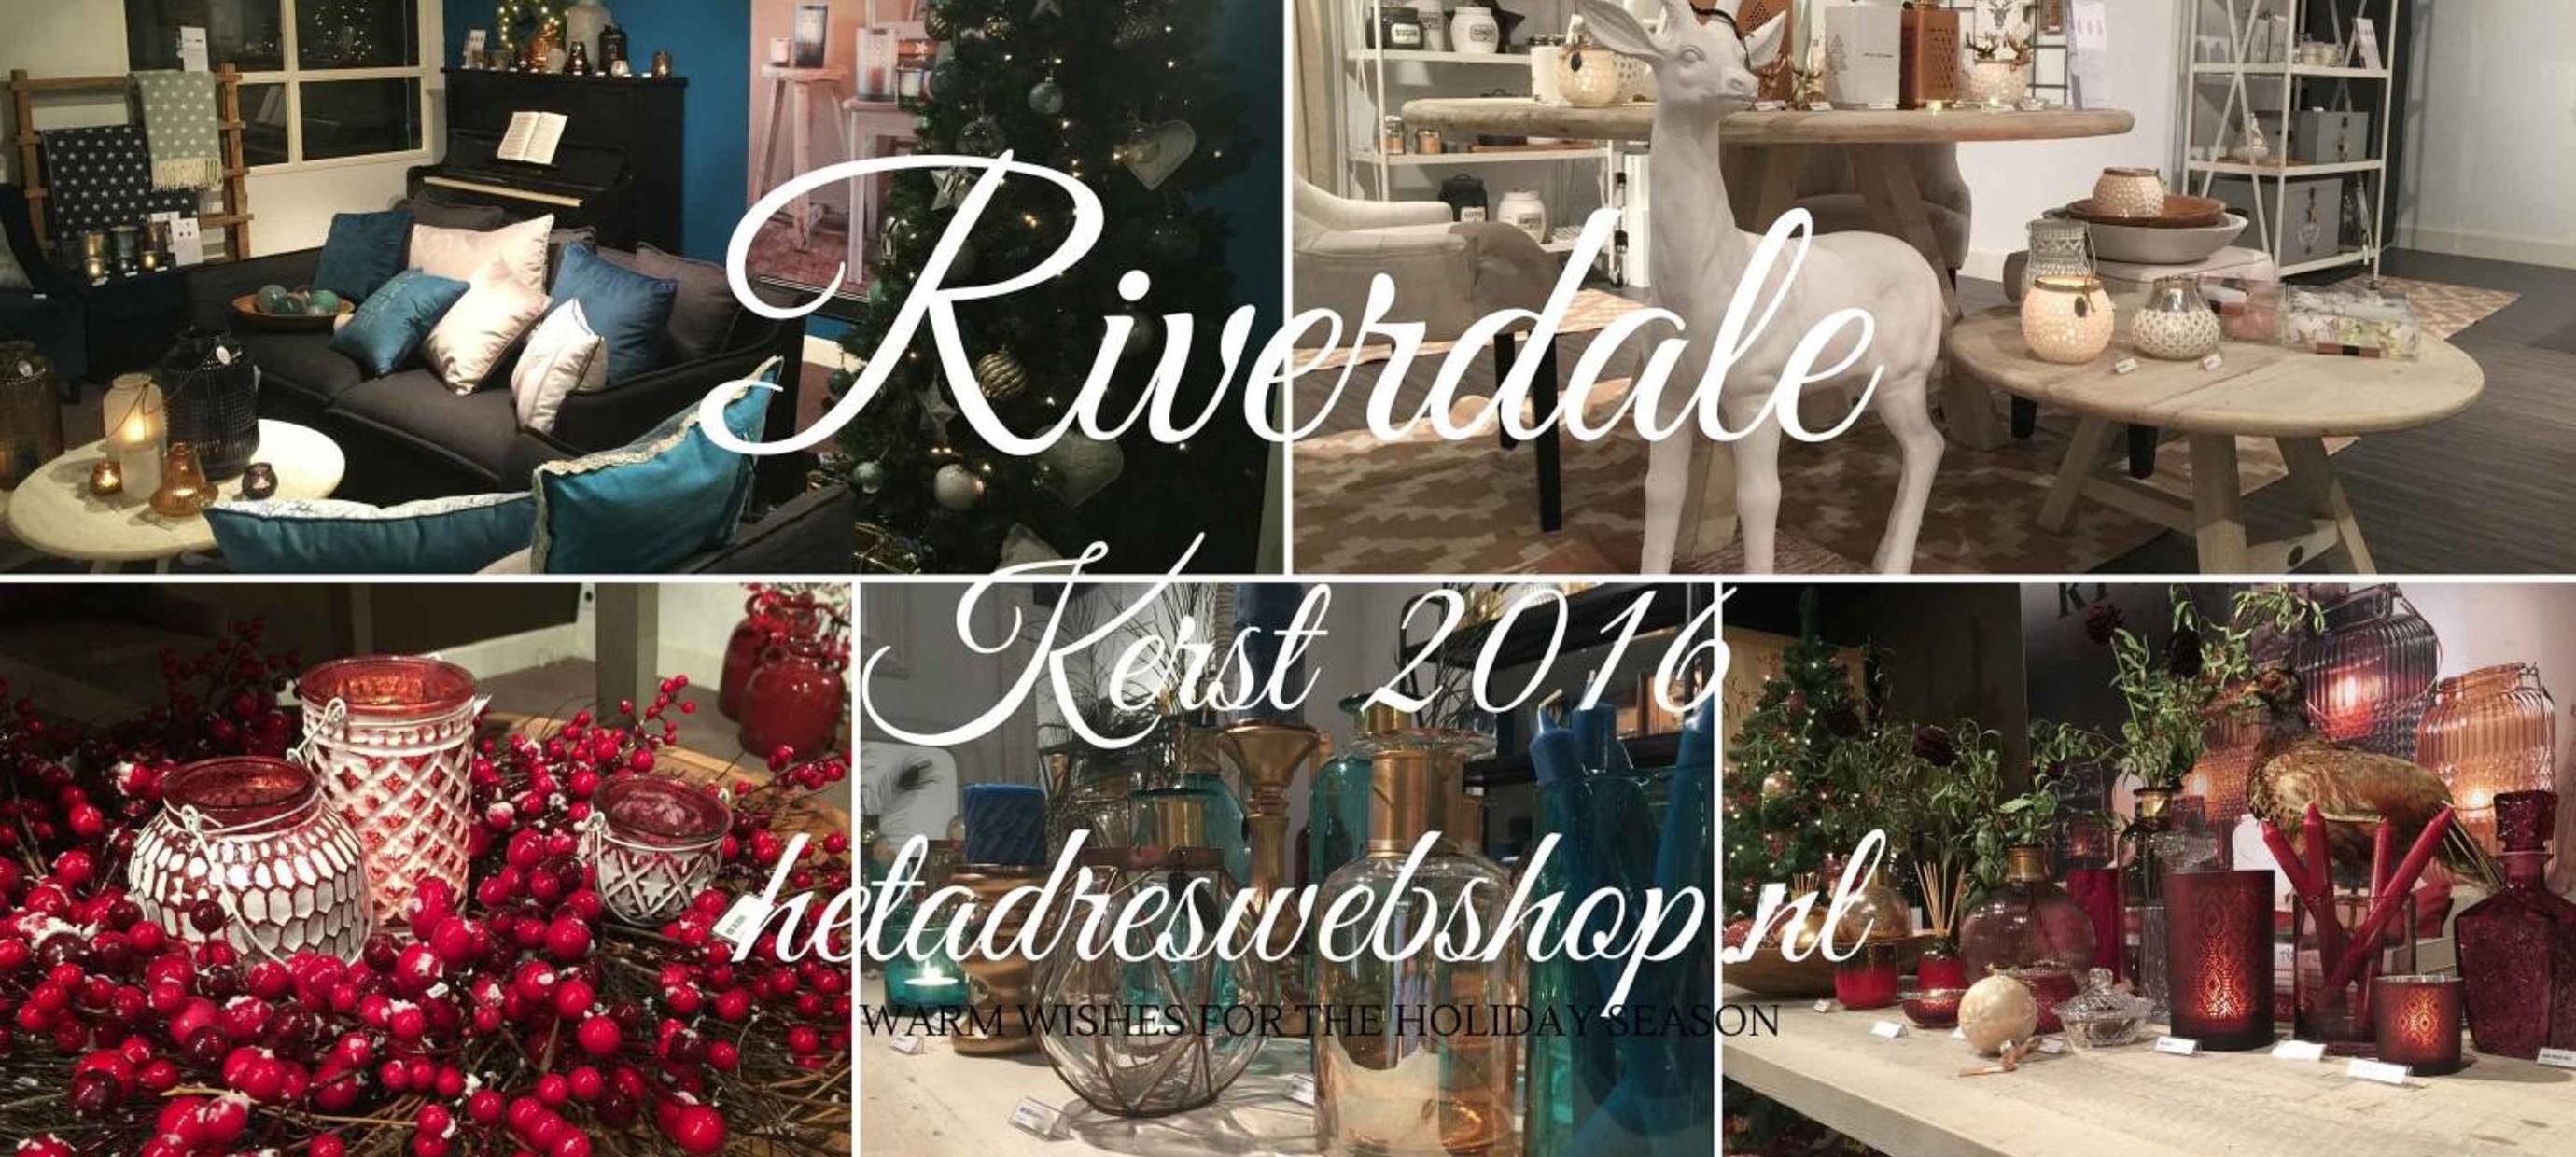 Riverdale kerst 2016